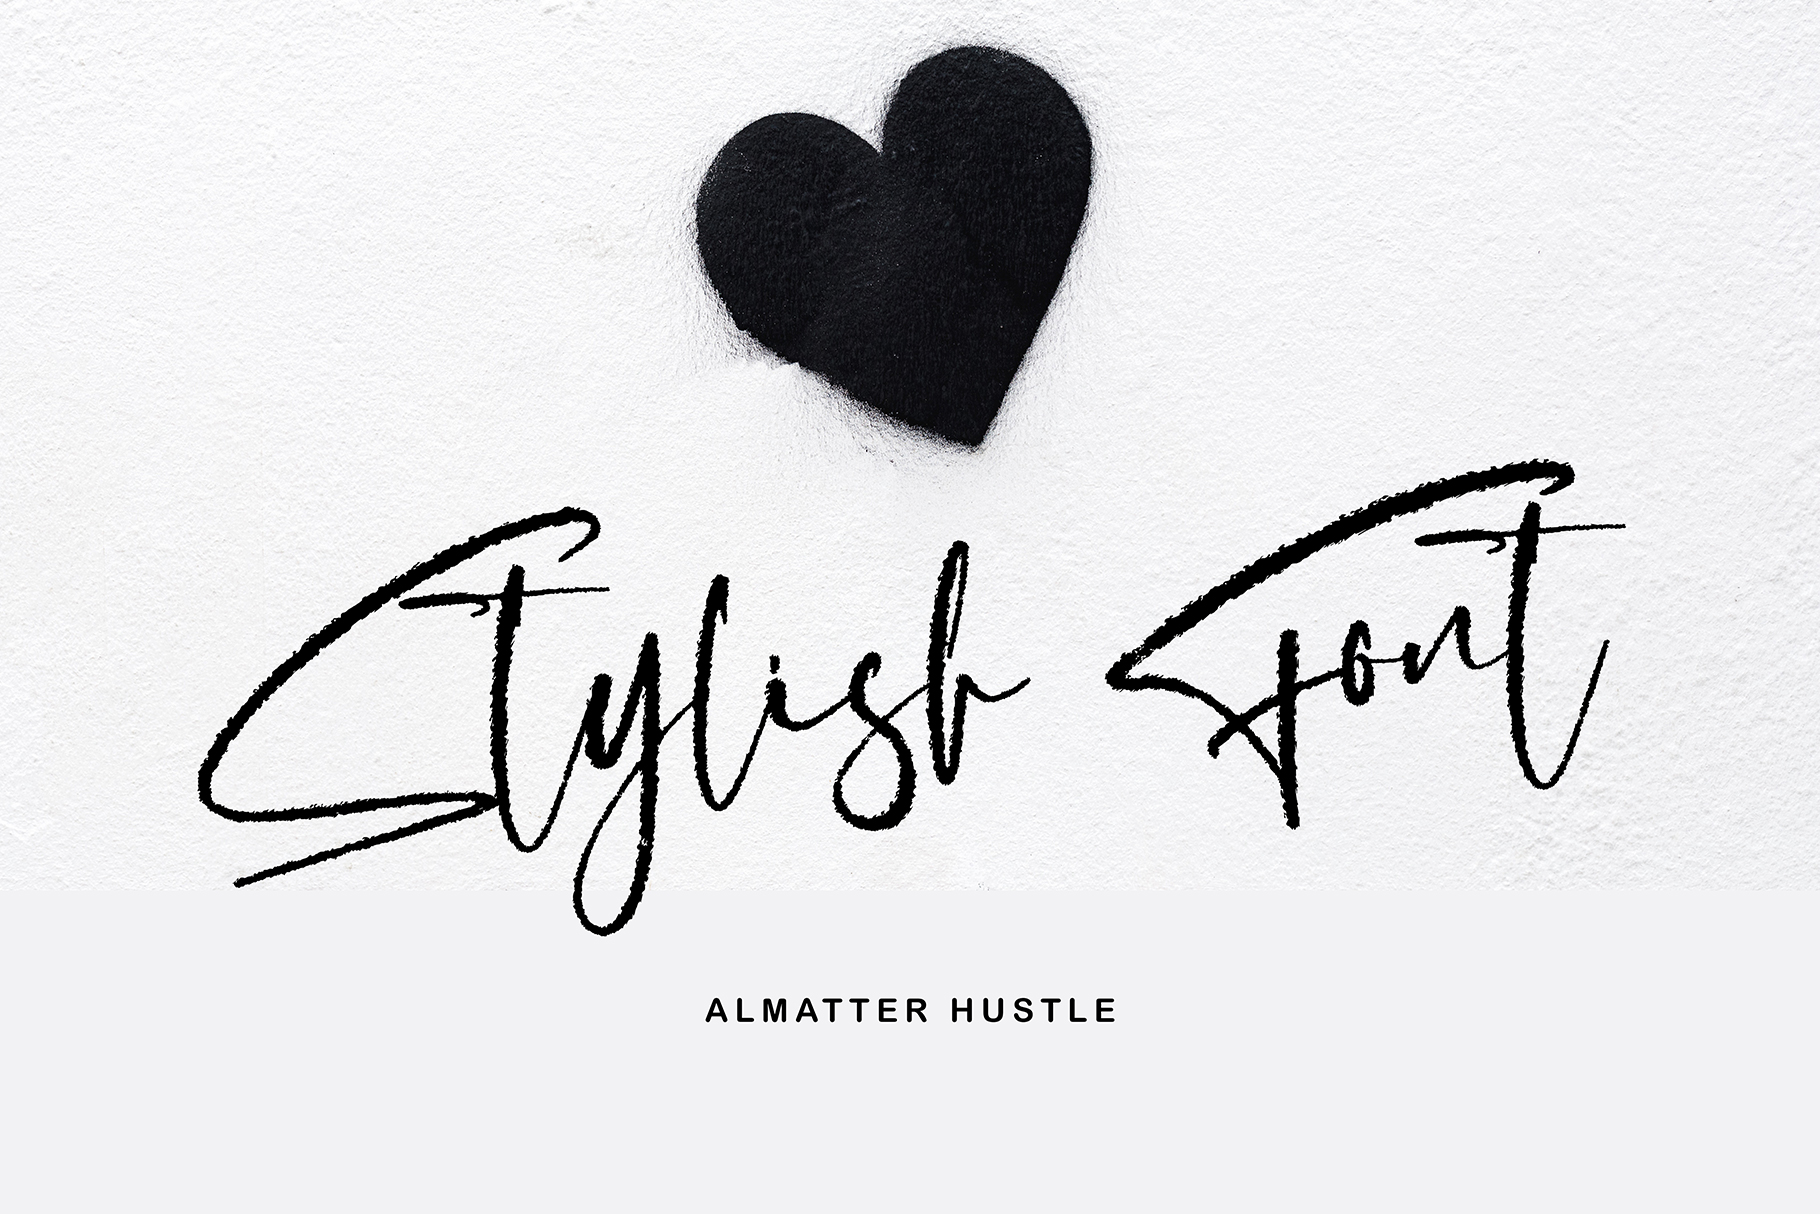 Almatter Hustle example image 2